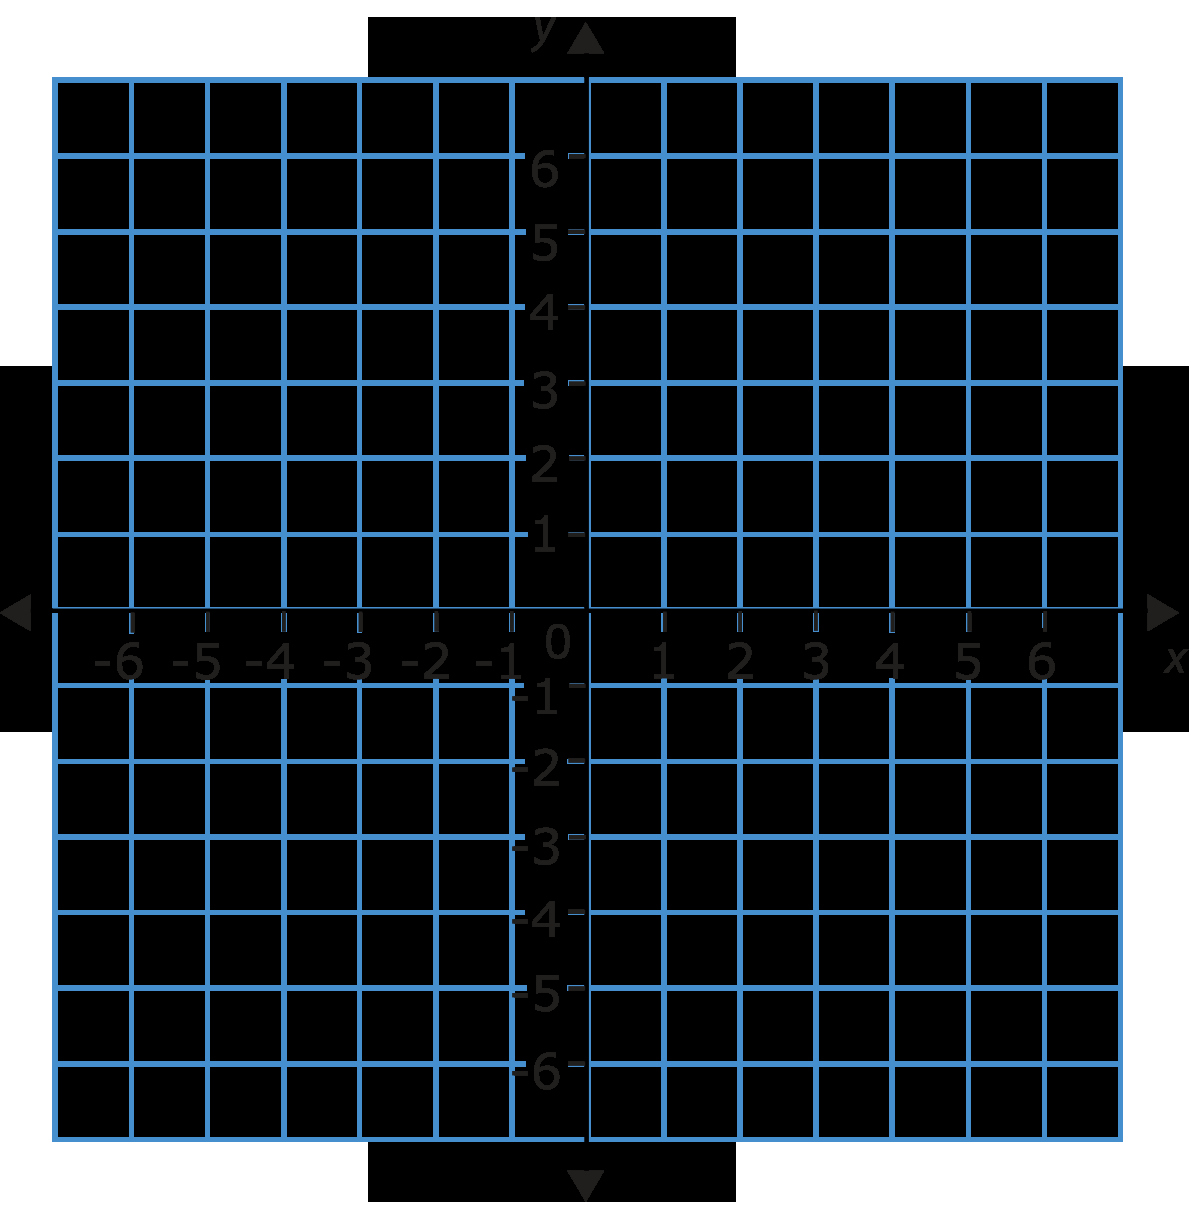 Coordinate Grid Worksheets Pdf Unique Graph Clipart 4 Quadrant Numbered Graph 4 Quadrant